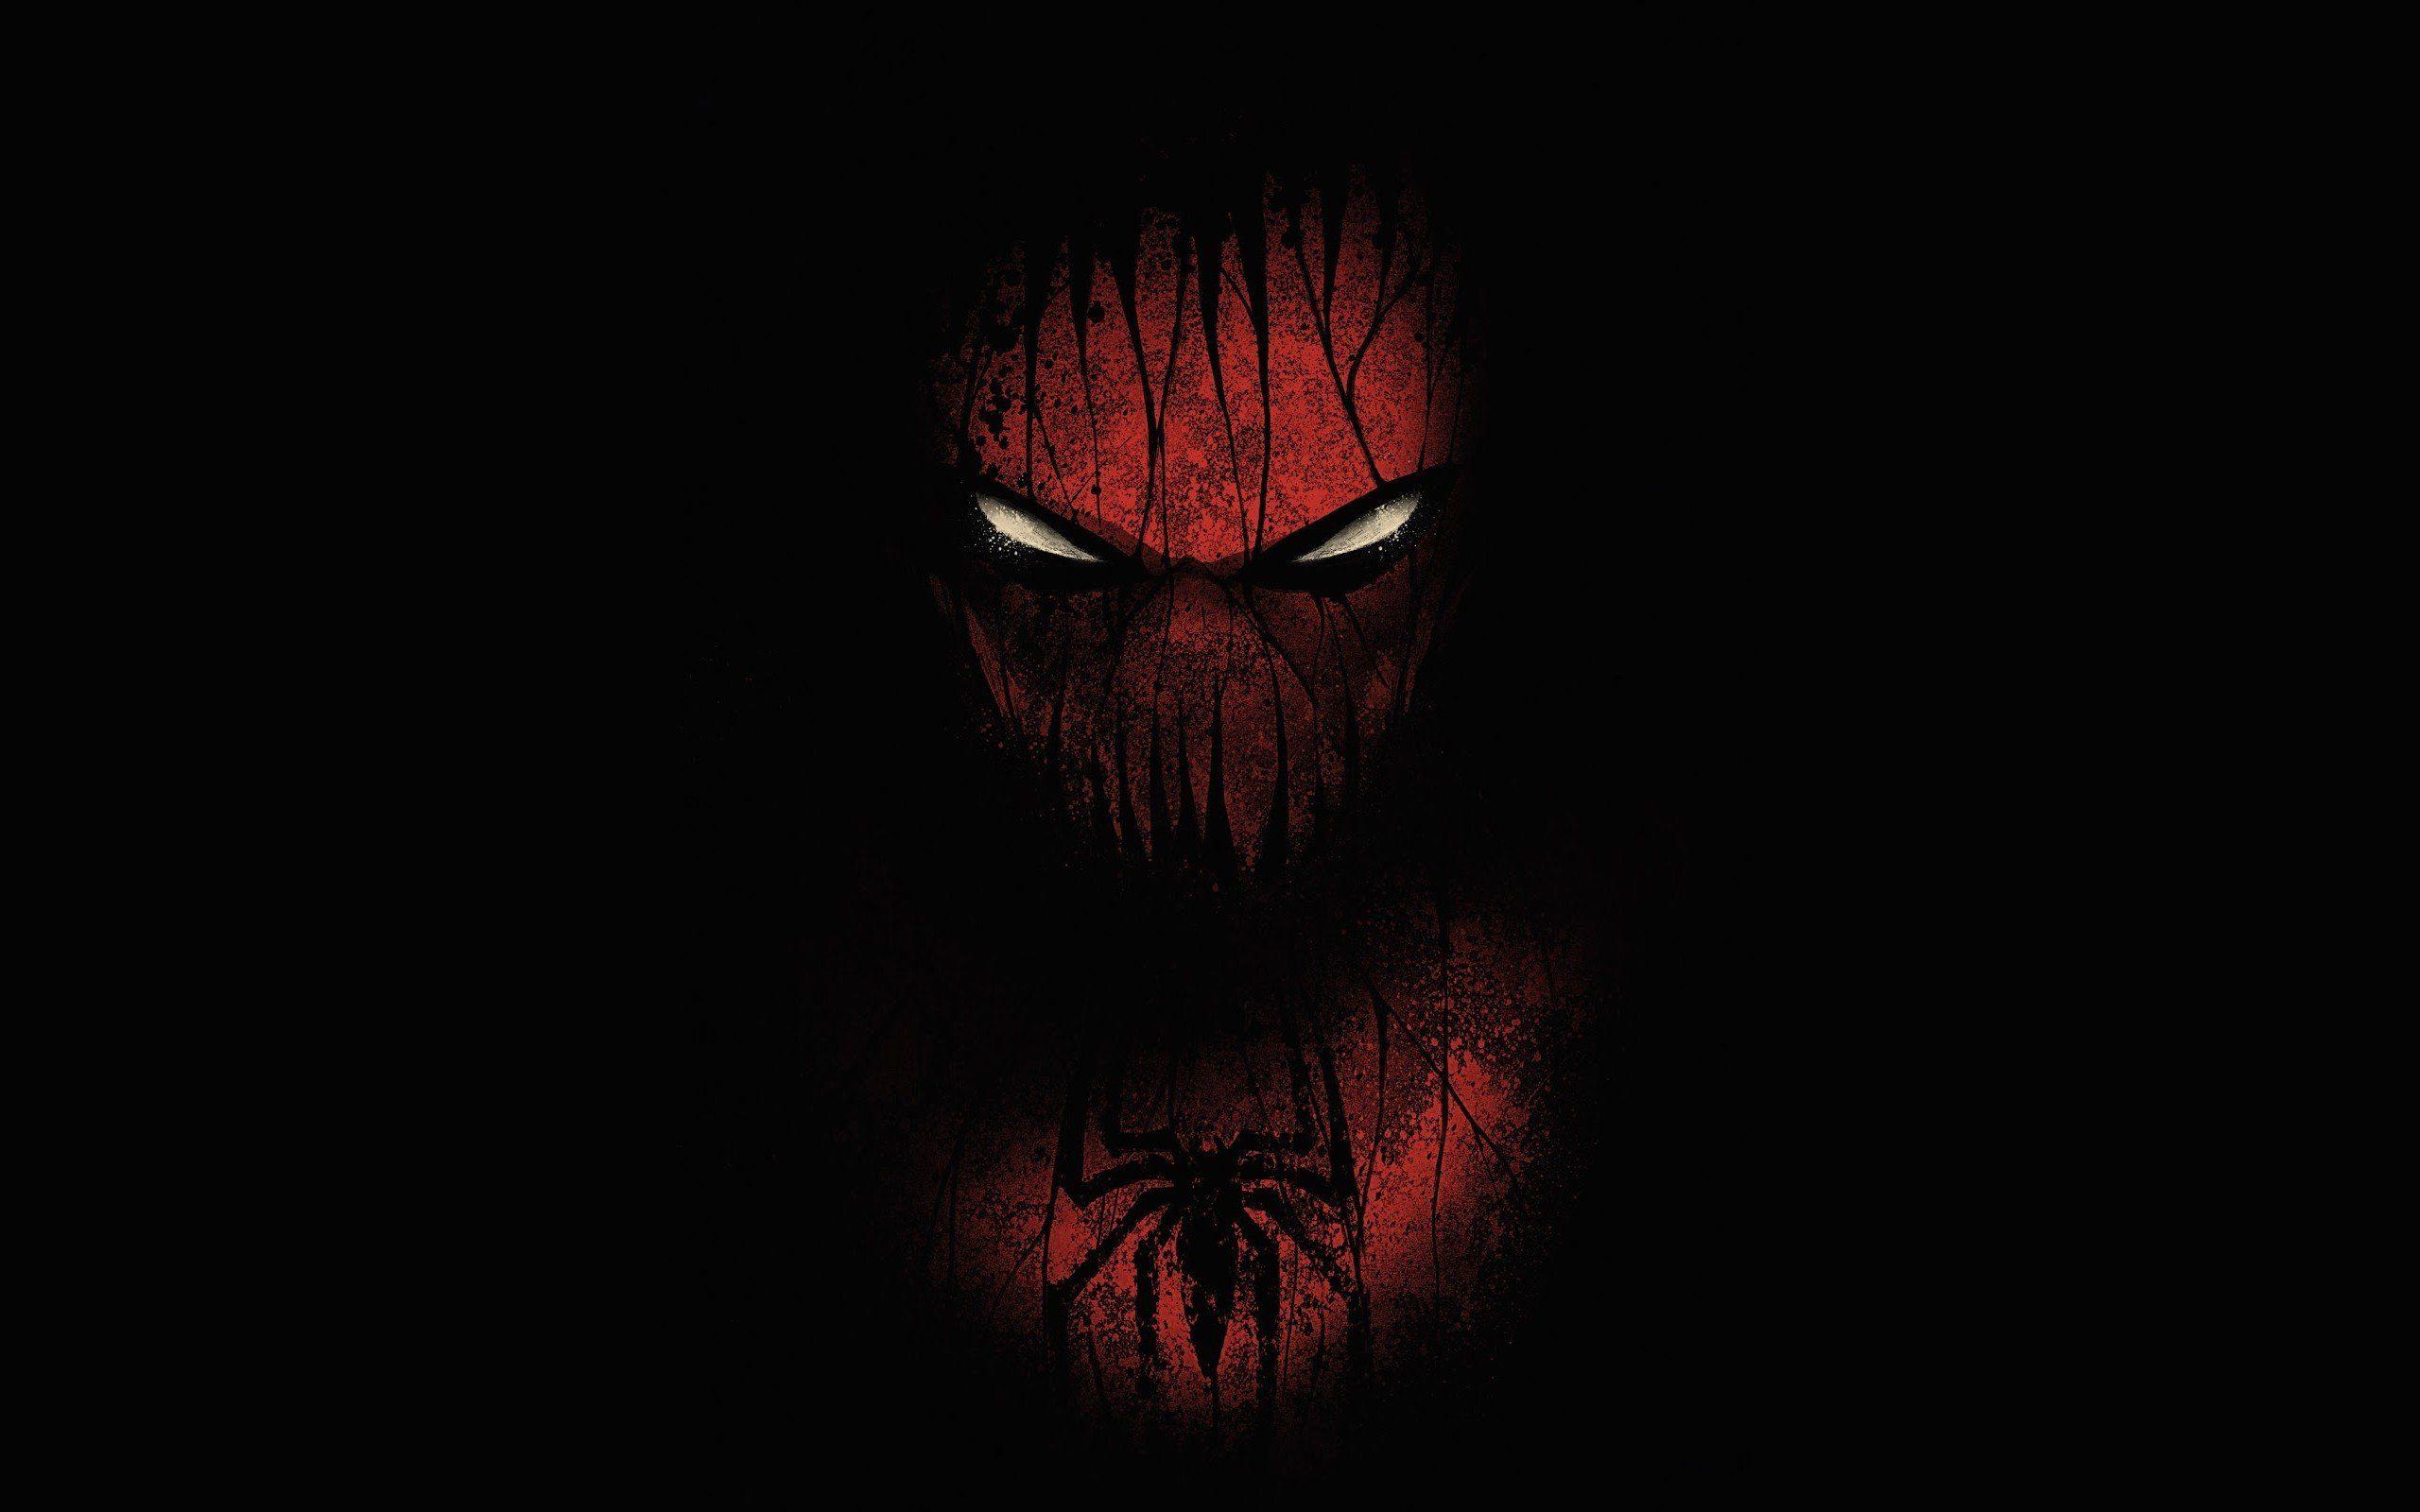 Black Spider Man Wallpapers Superhero Wallpaper Marvel Wallpaper Spiderman Artwork